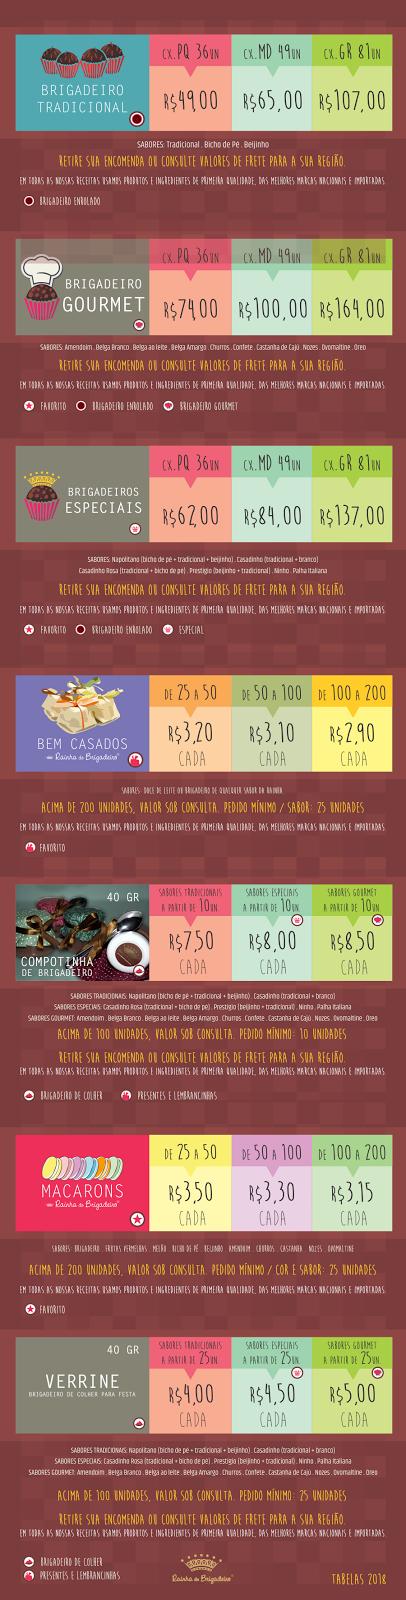 Tabelas de Preços: